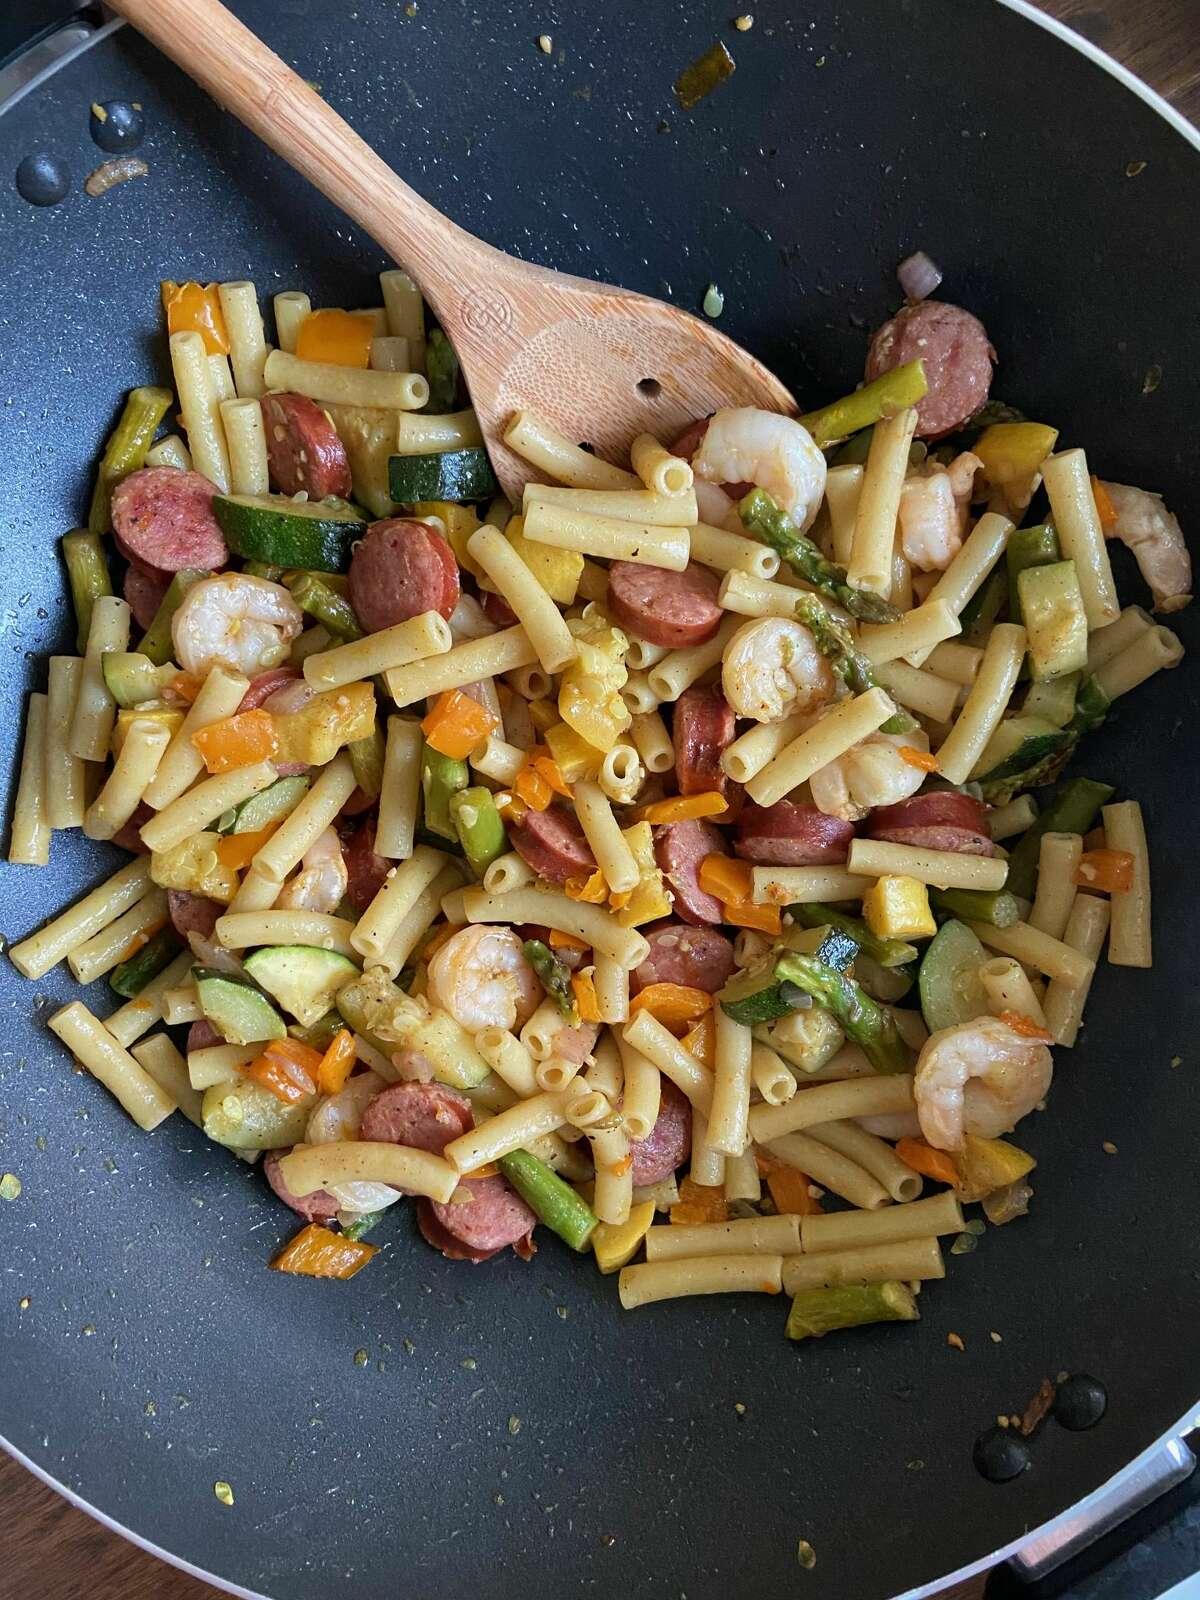 Shrimp and sausage with veggies